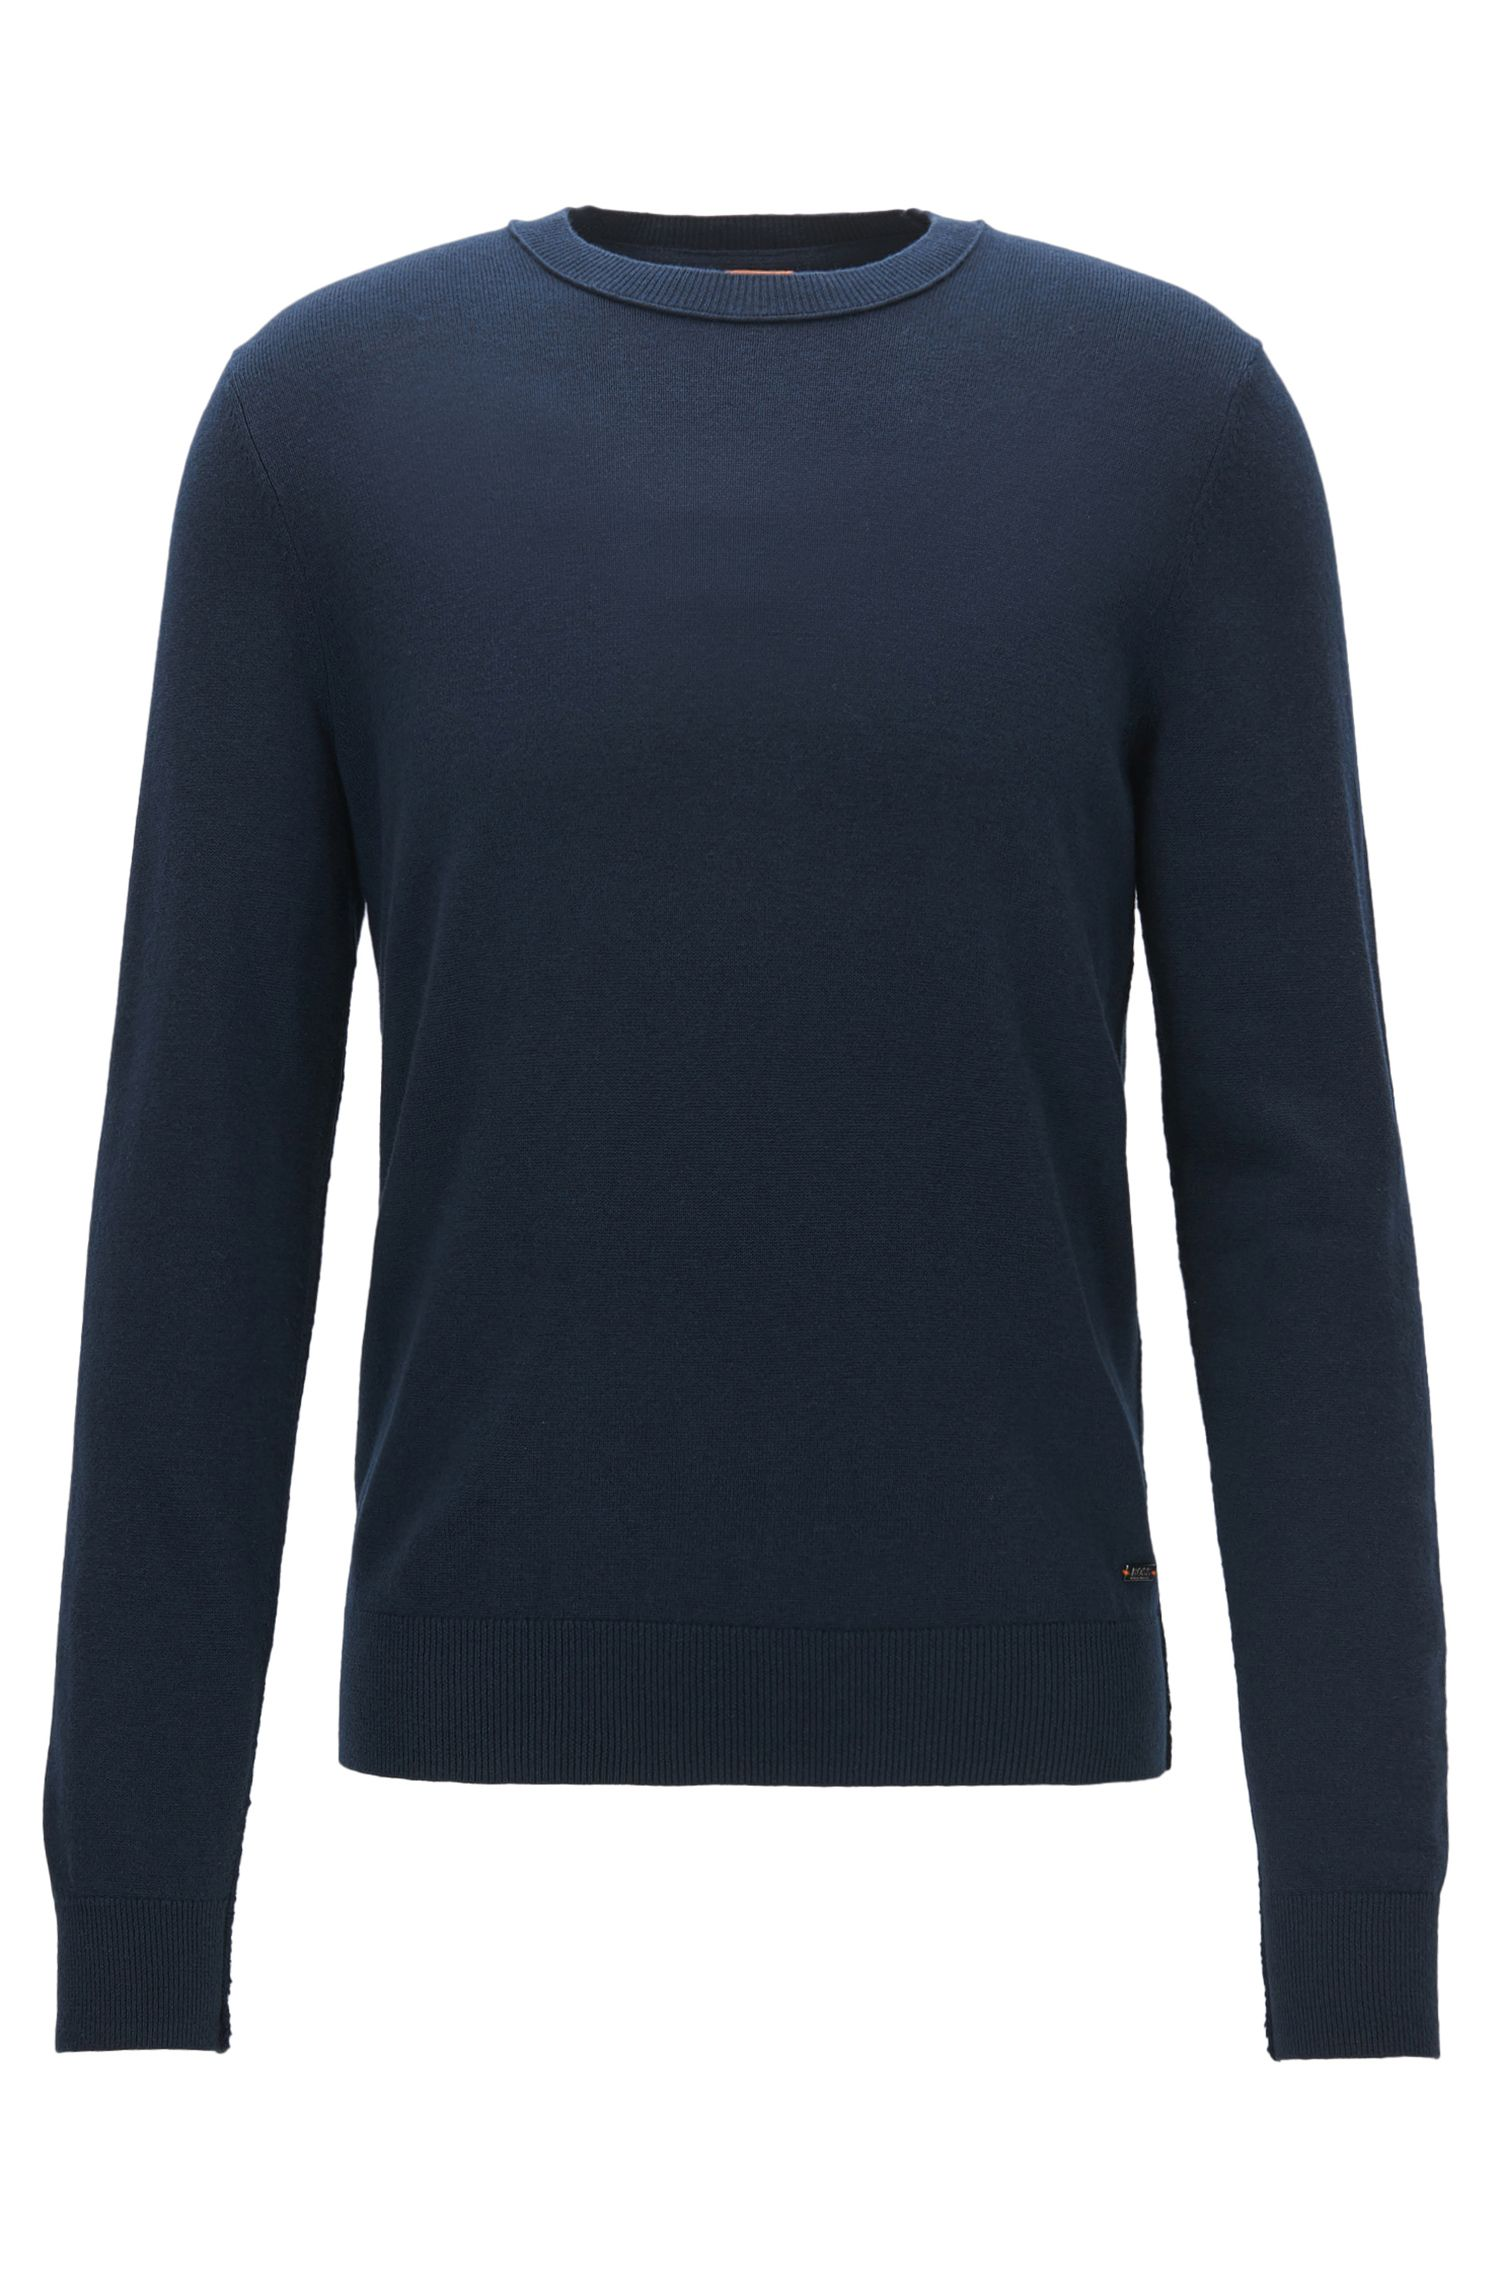 Lightweight sweater with broken-edge detailing